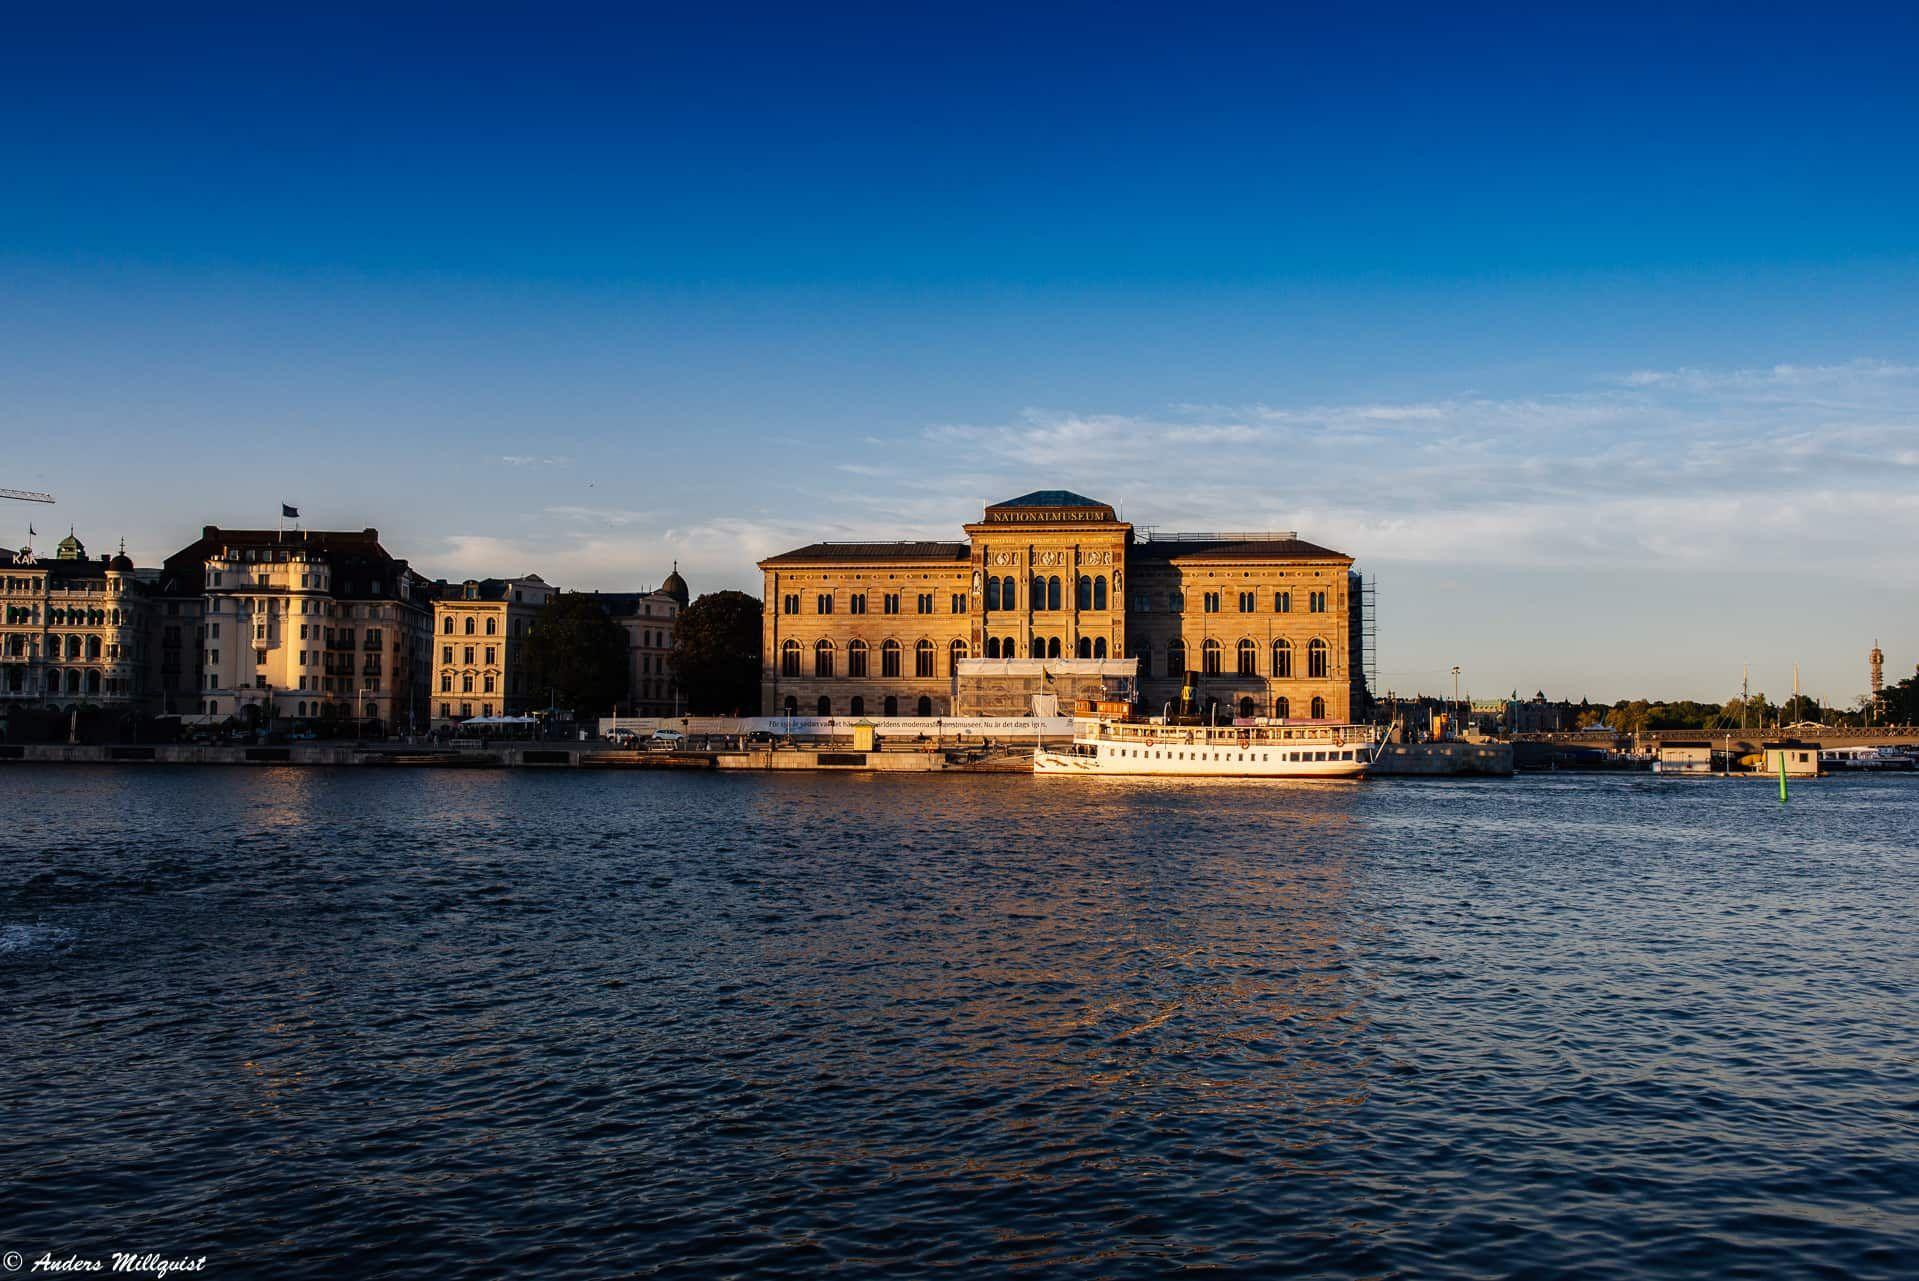 Stockholm. - https://millqvist.se/wp-content/uploads/D17_1576.jpg - https://millqvist.se/?p=529